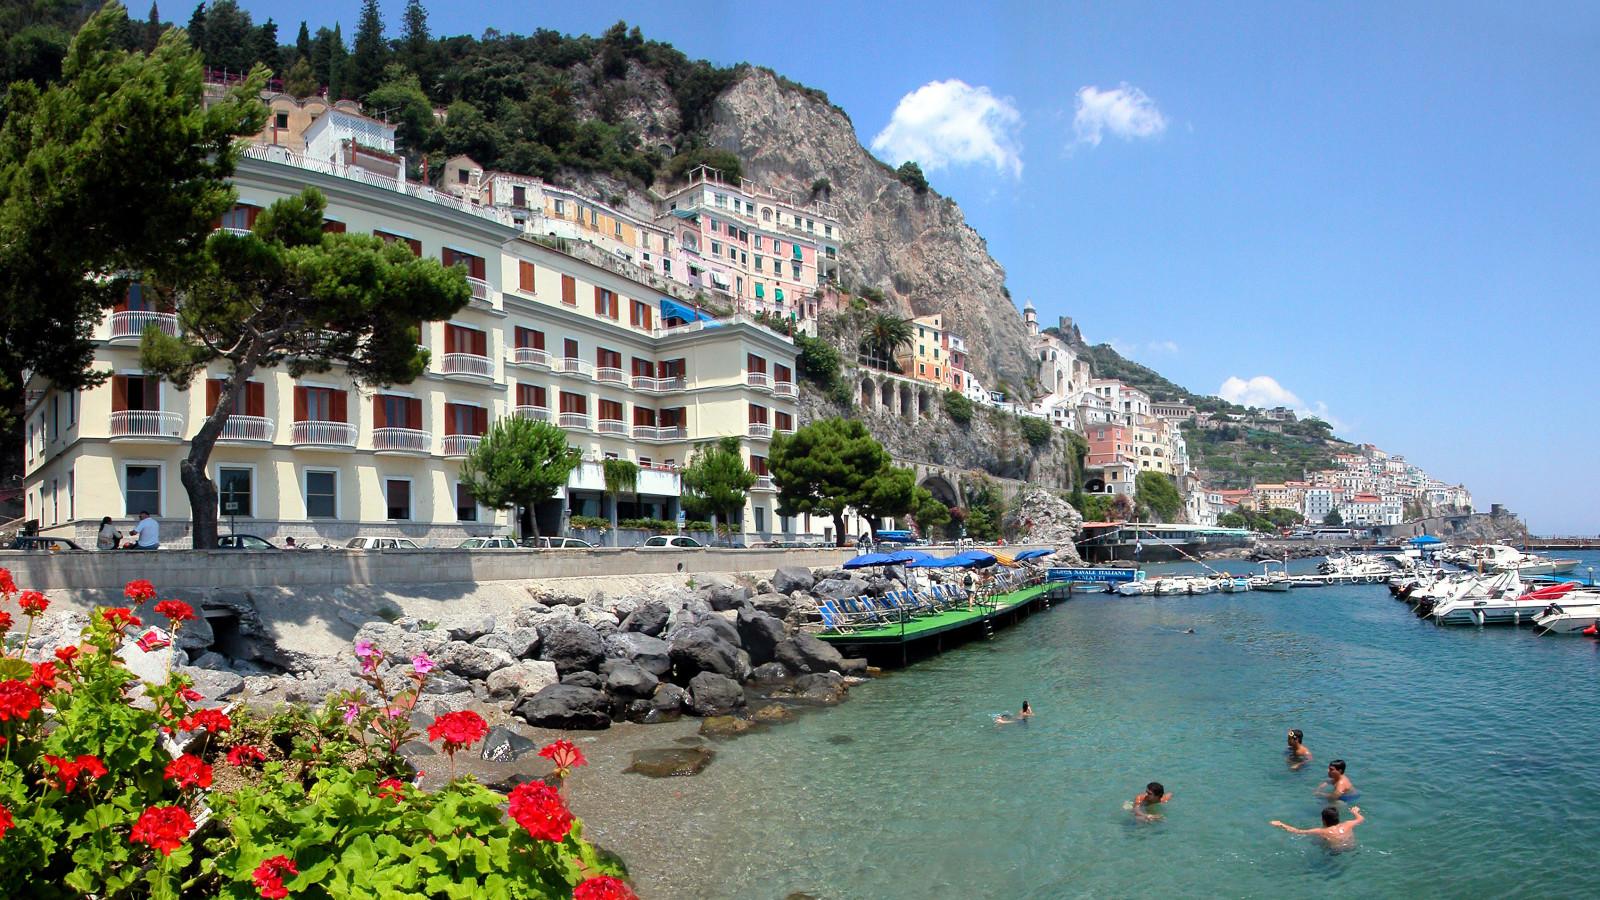 Hotel La Bussola Liguria